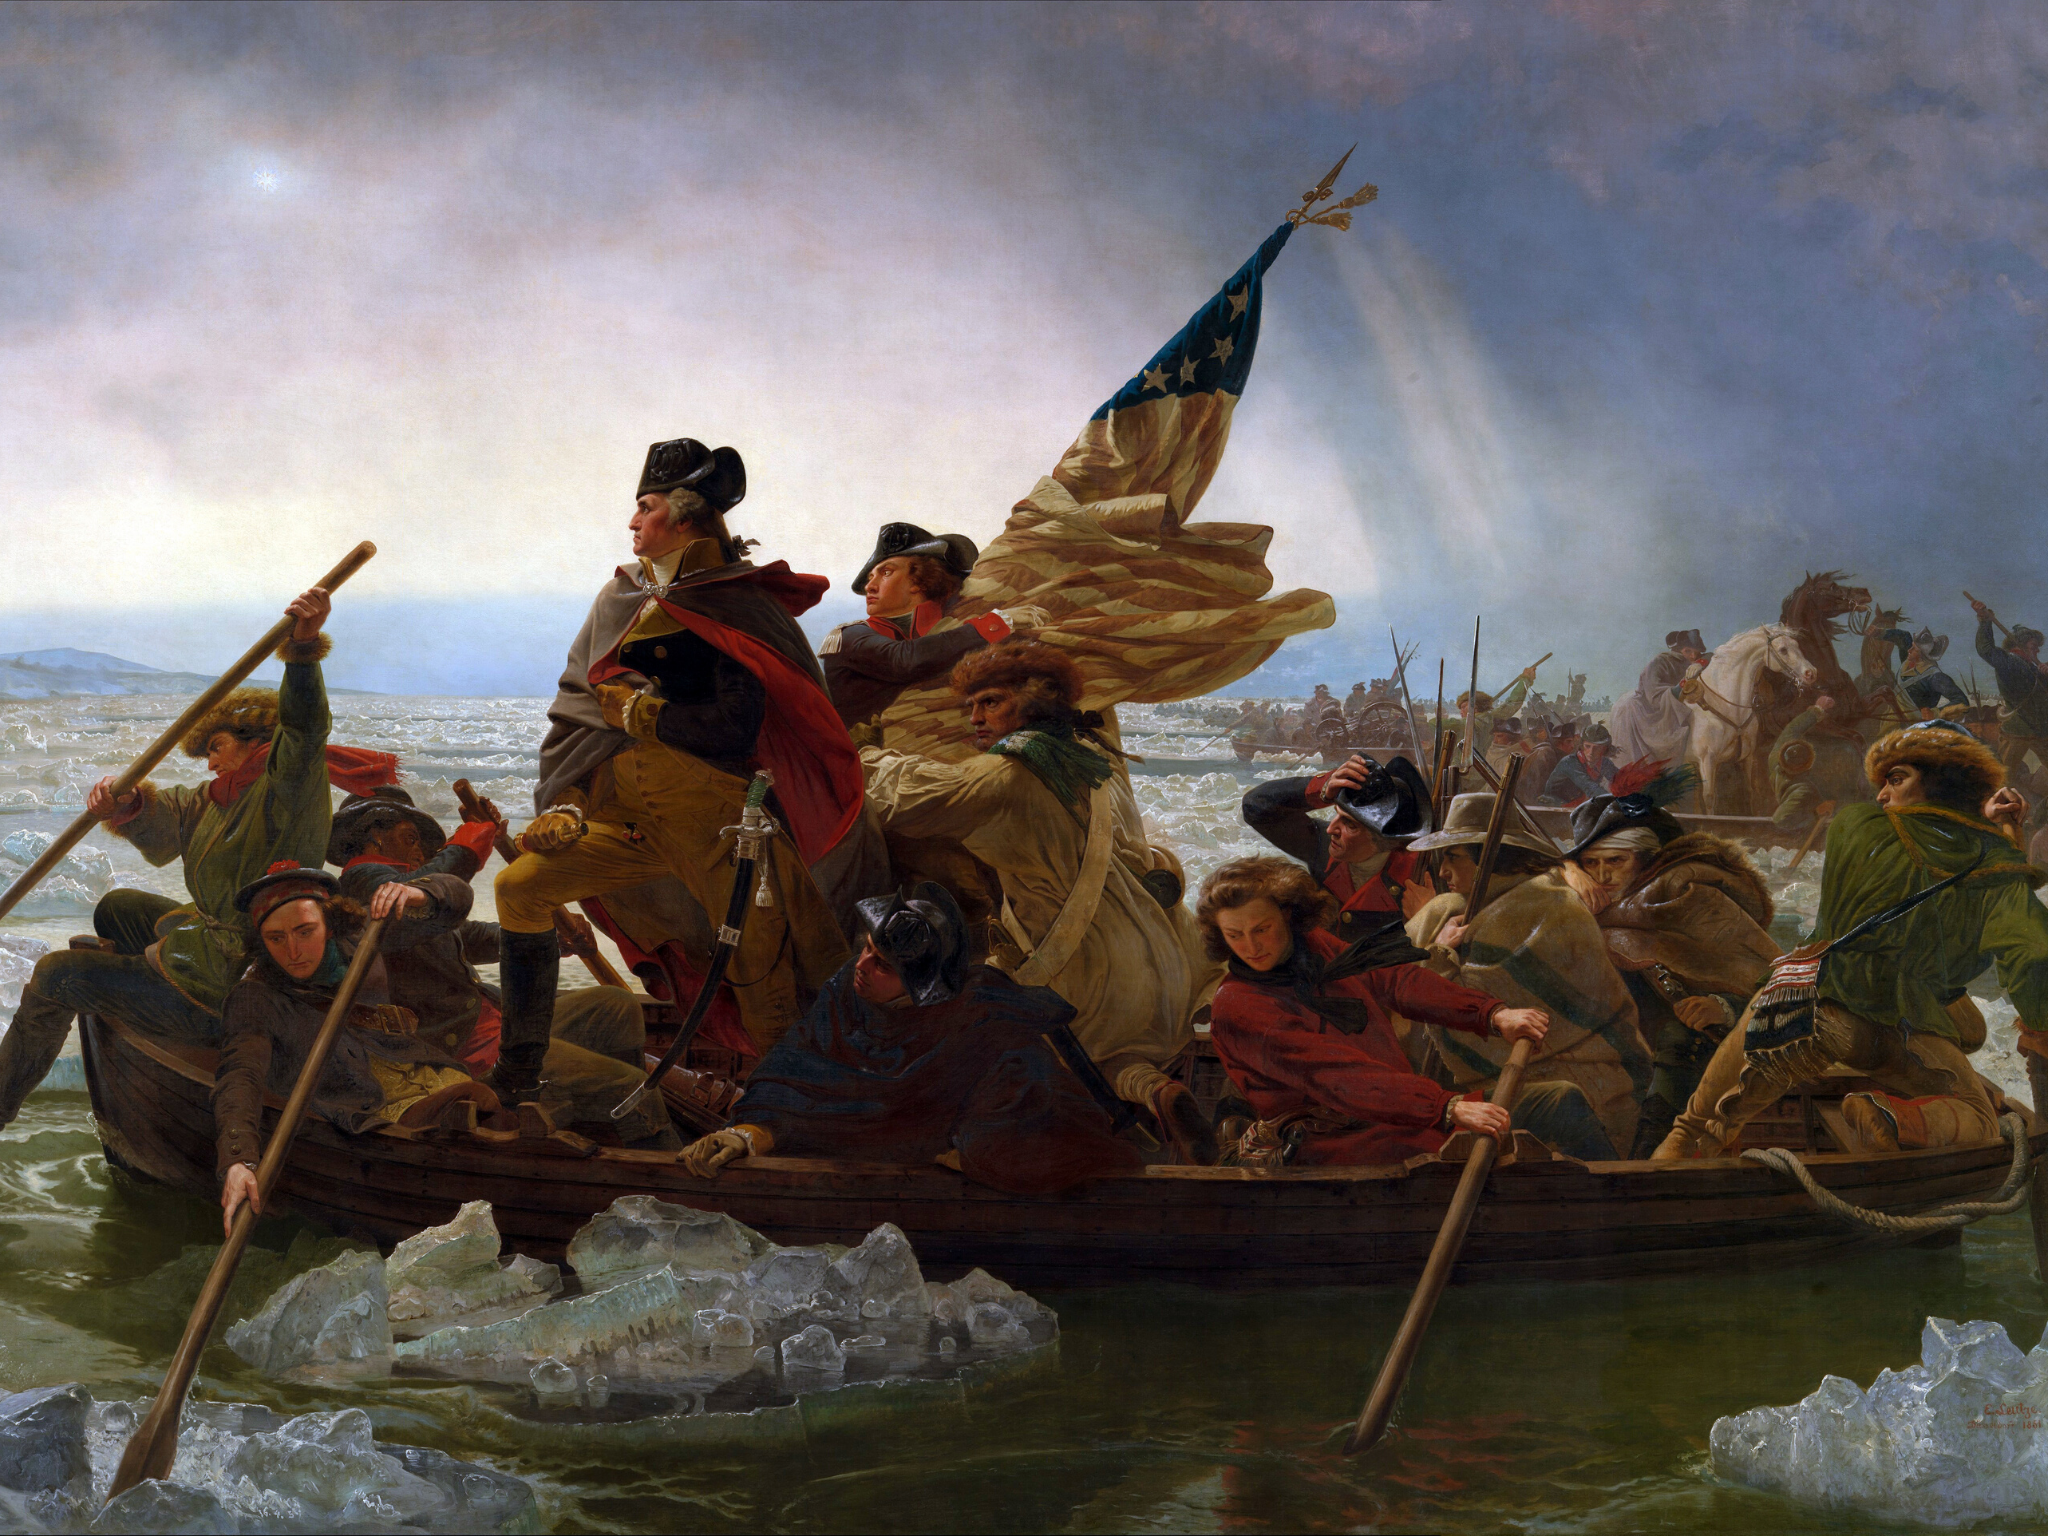 George Washington Crossing the Delaware by Emanuel Leutz, 1851